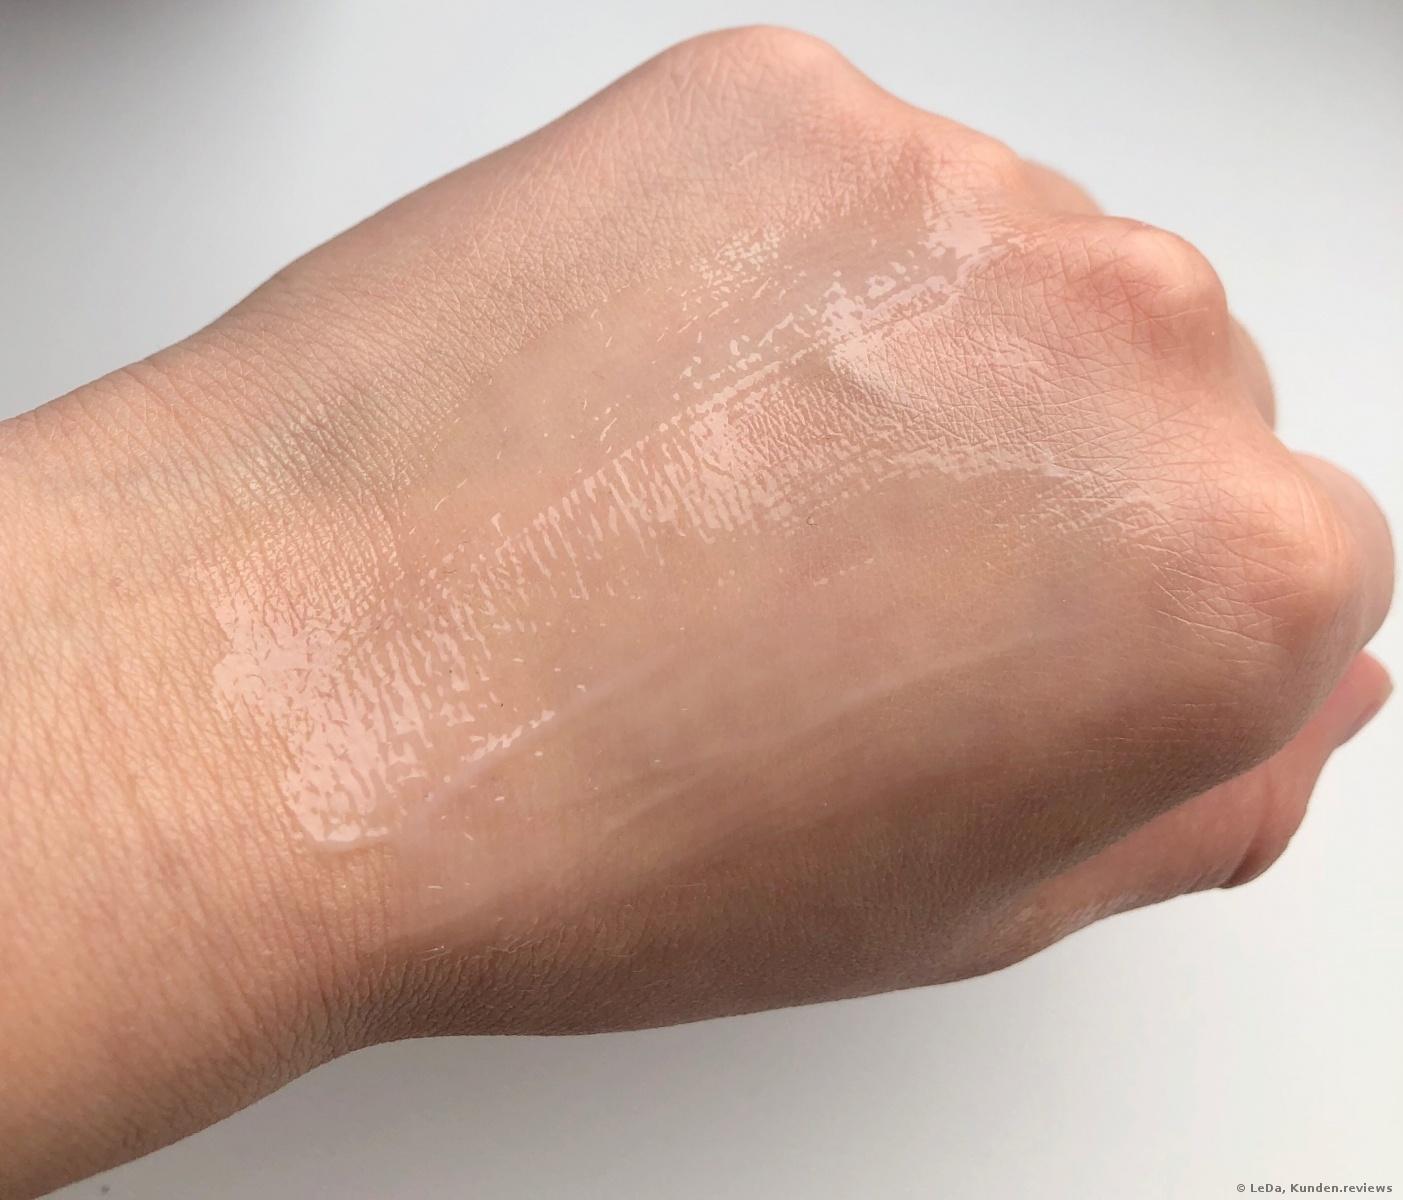 Estee Lauder Perfectionist Pro Instant Resurfacing Peel with 9.9% AHAs + BHA